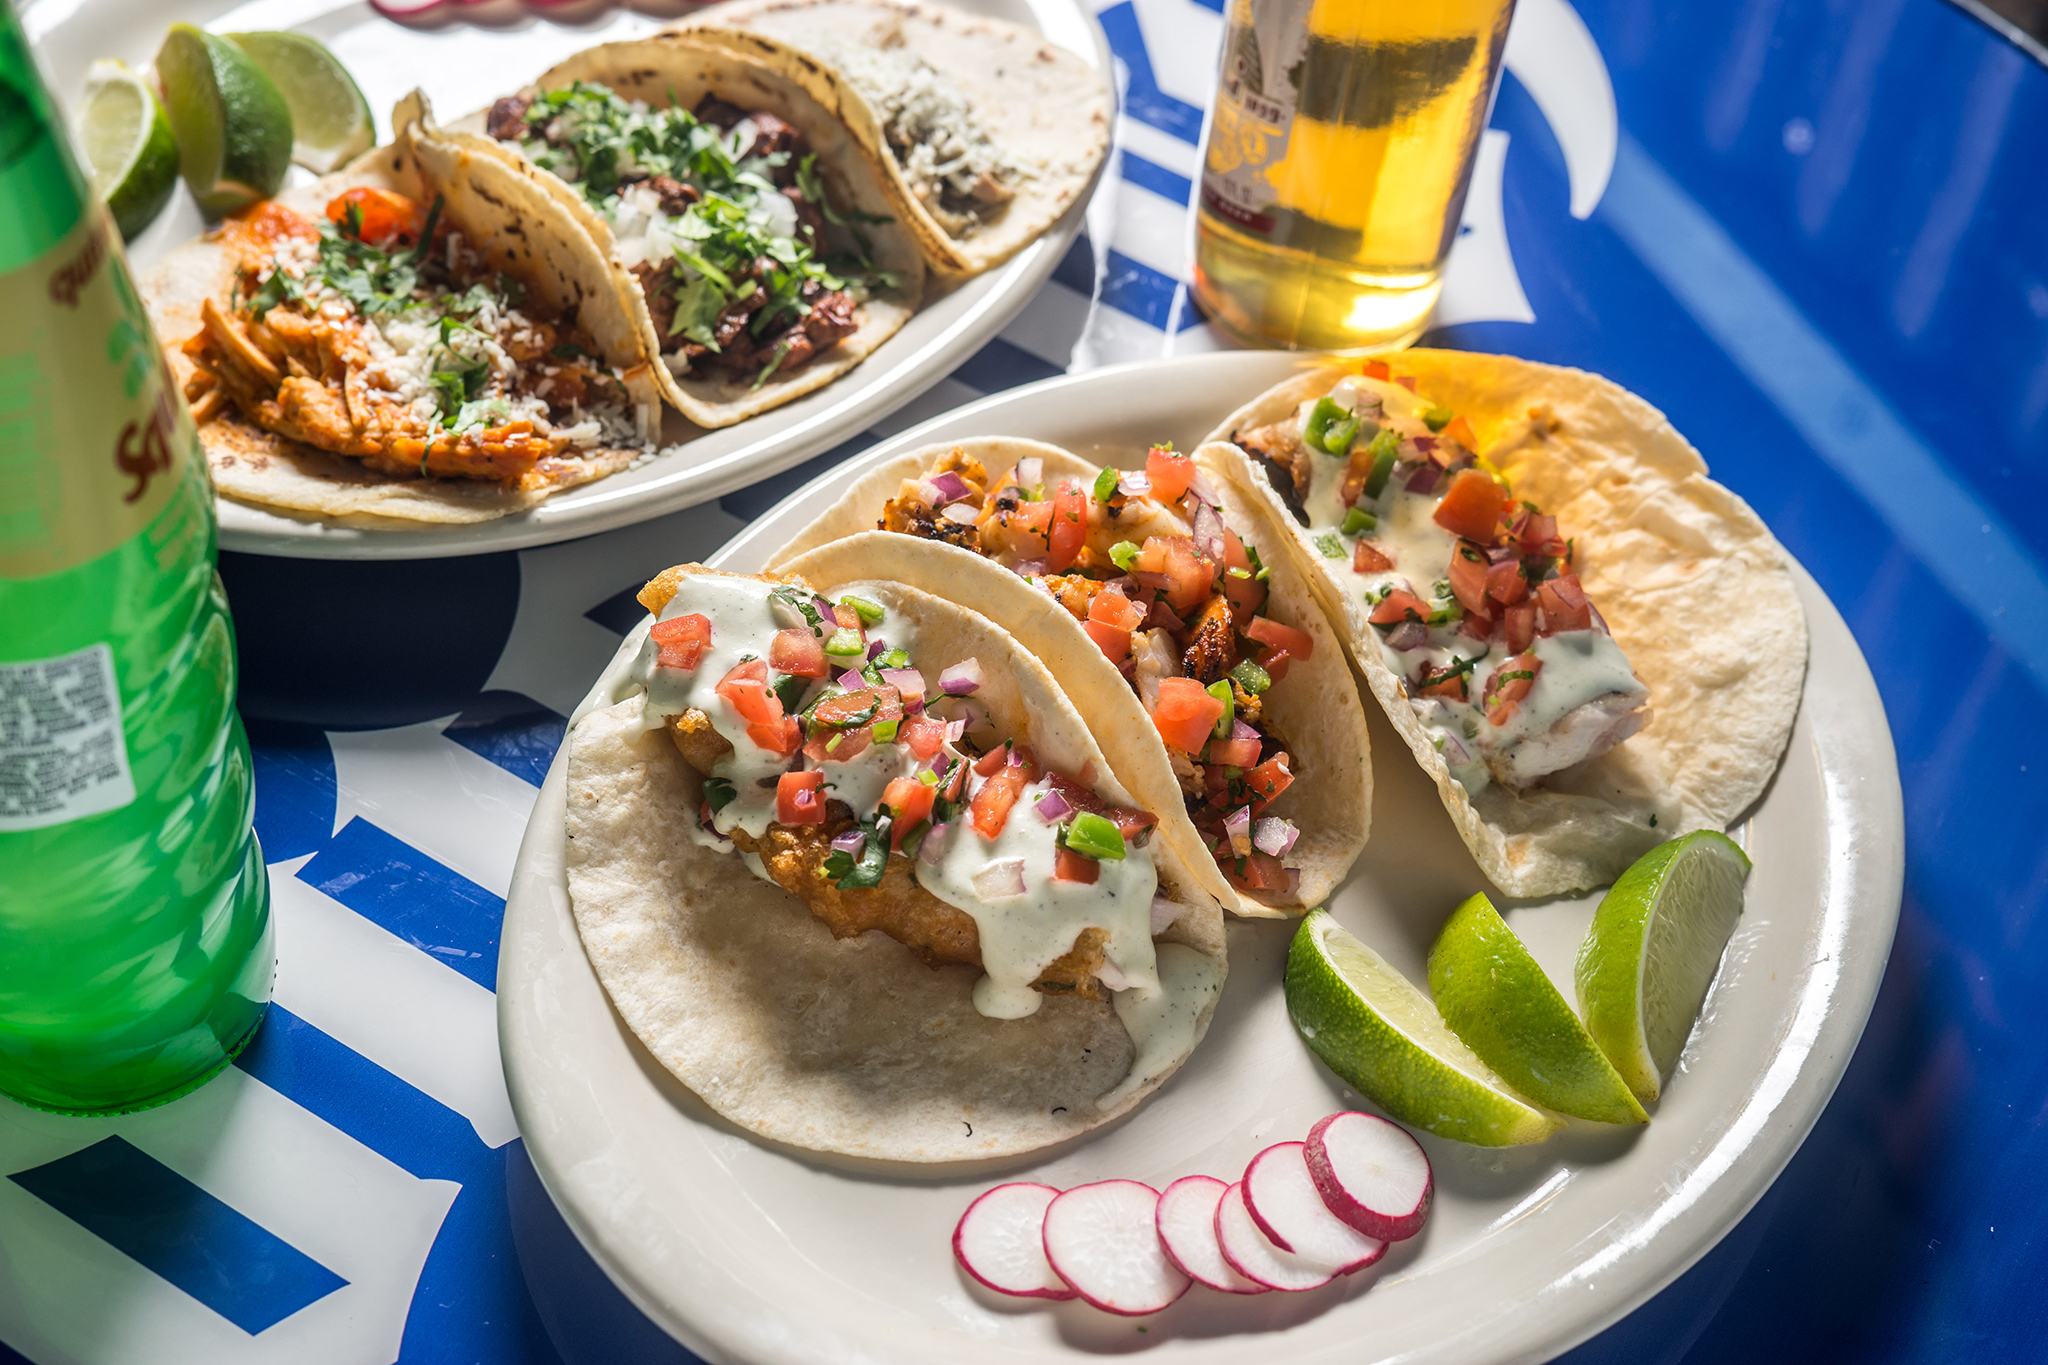 beach food bar tiki bars mexican drinks ziggy york frozen nyc tropical brooklyn